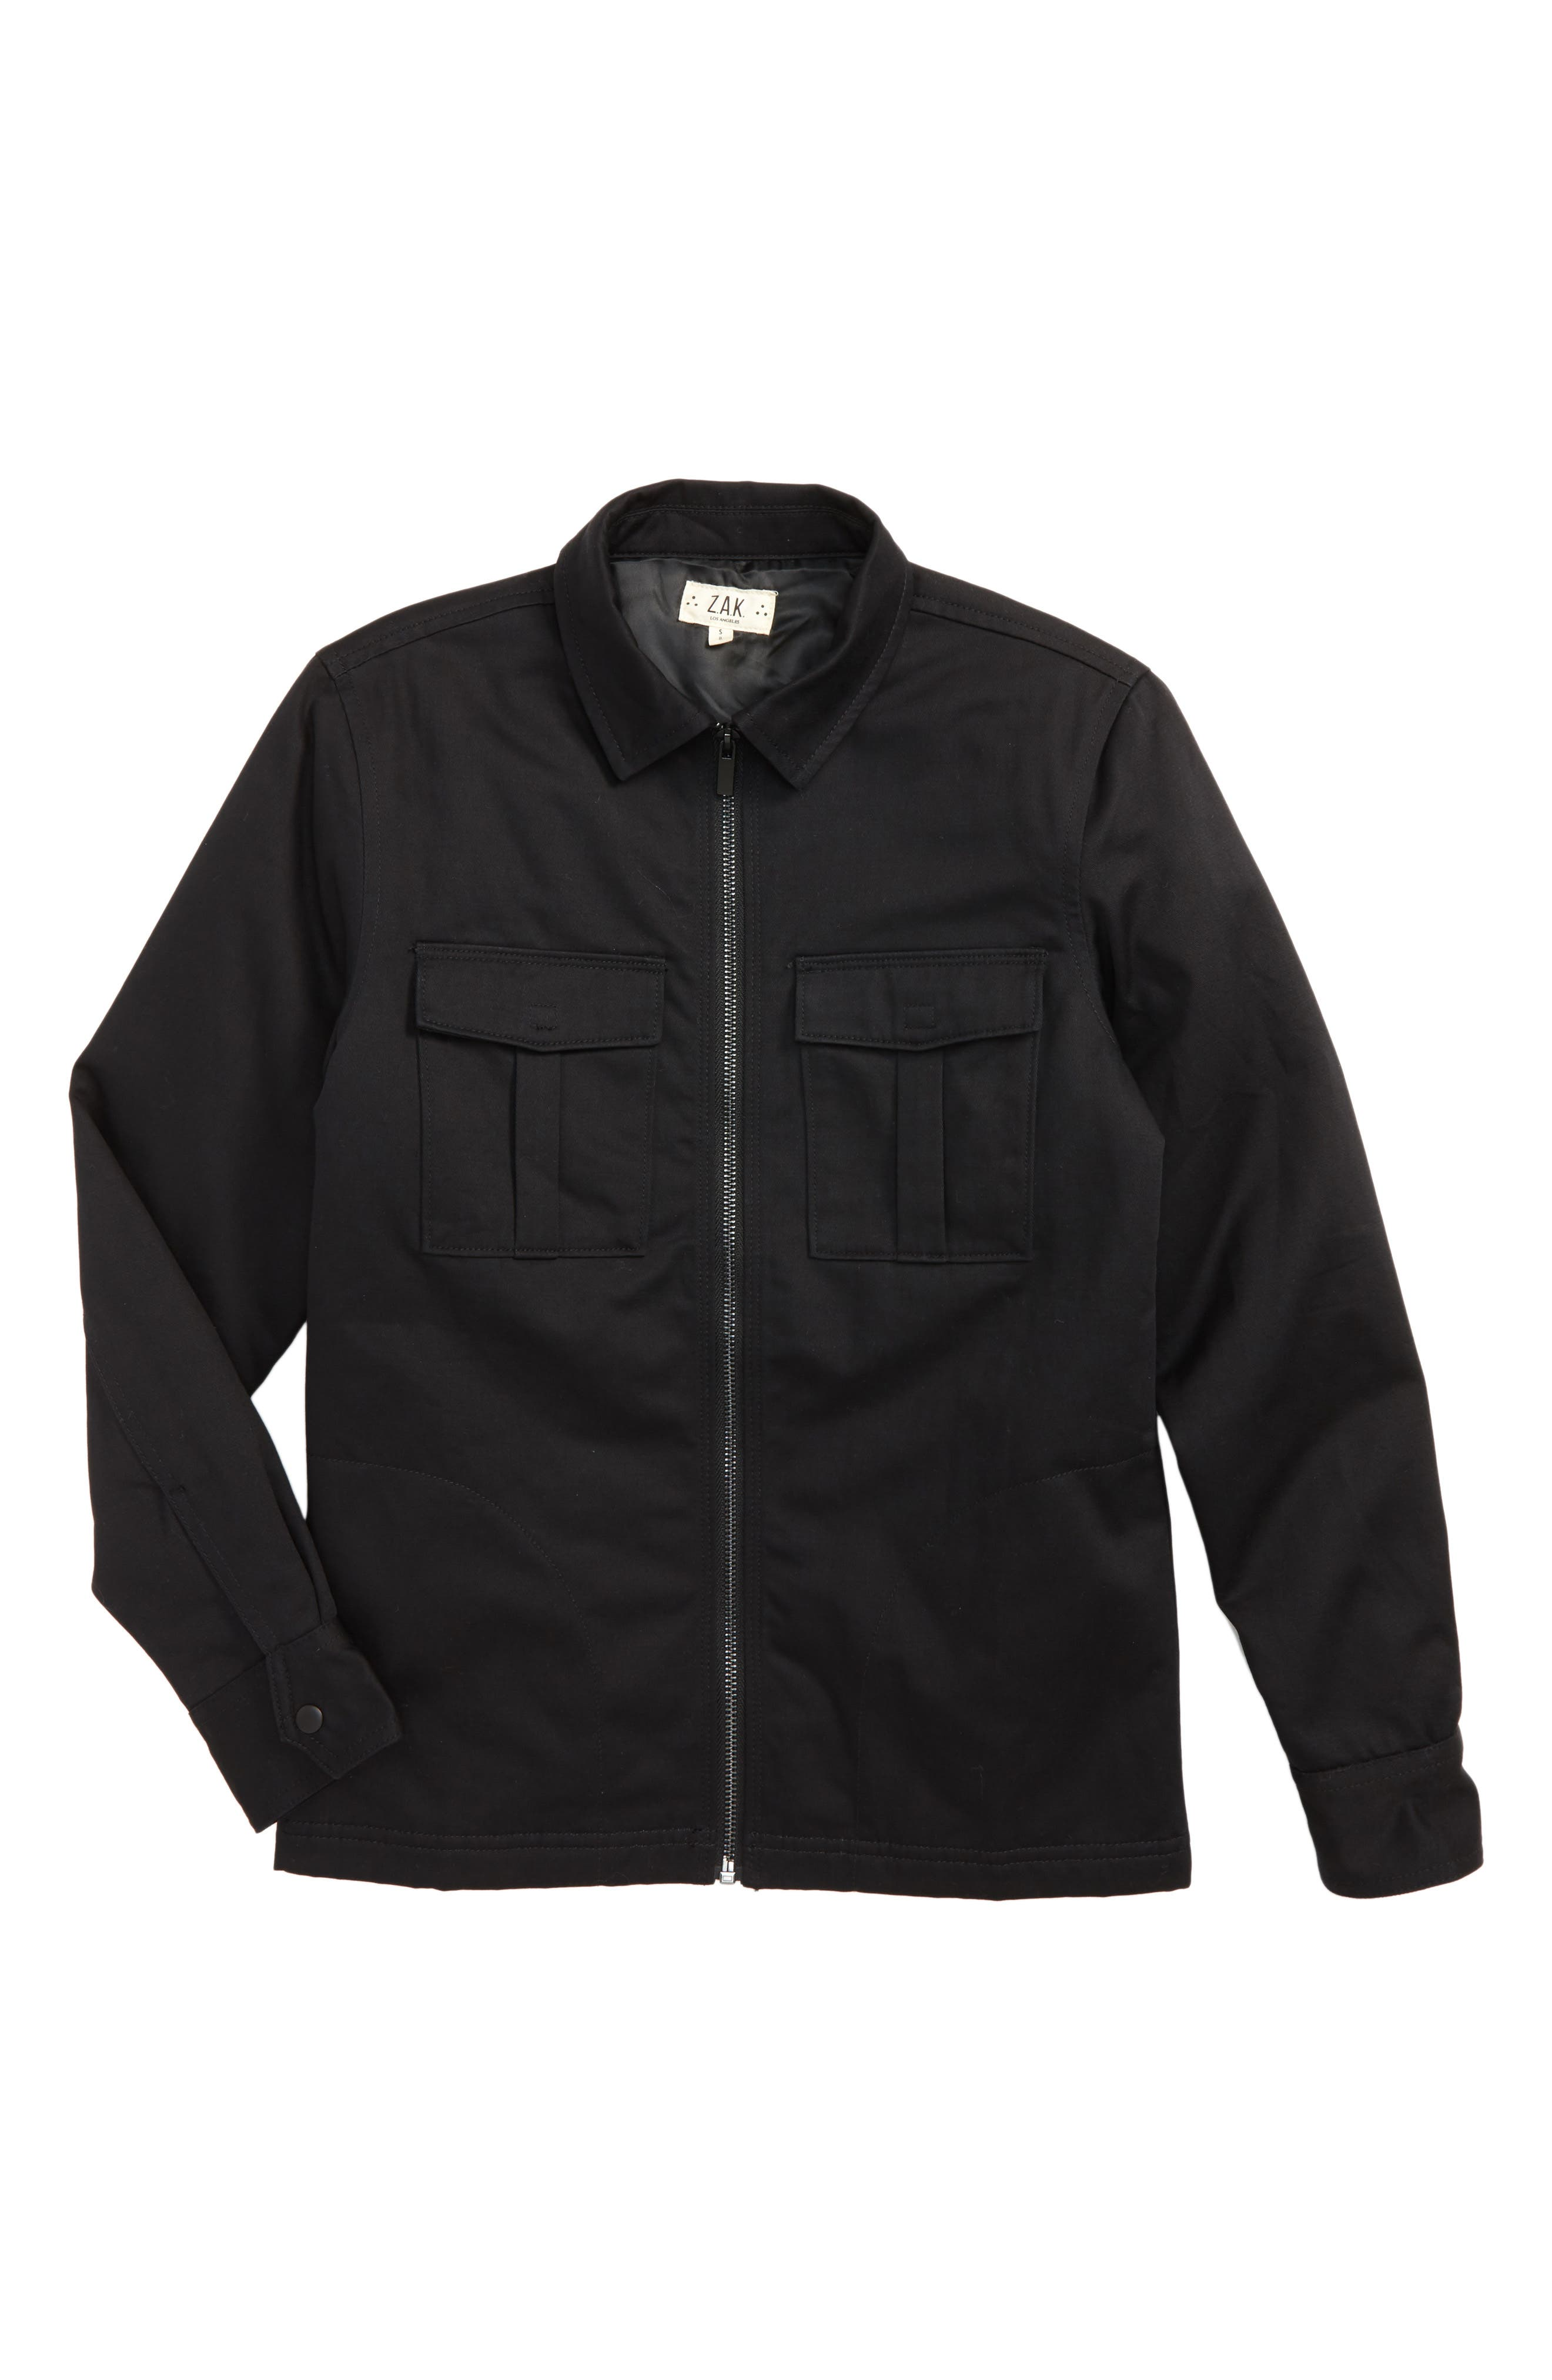 Lost Angeles Jacket,                         Main,                         color, BLACK